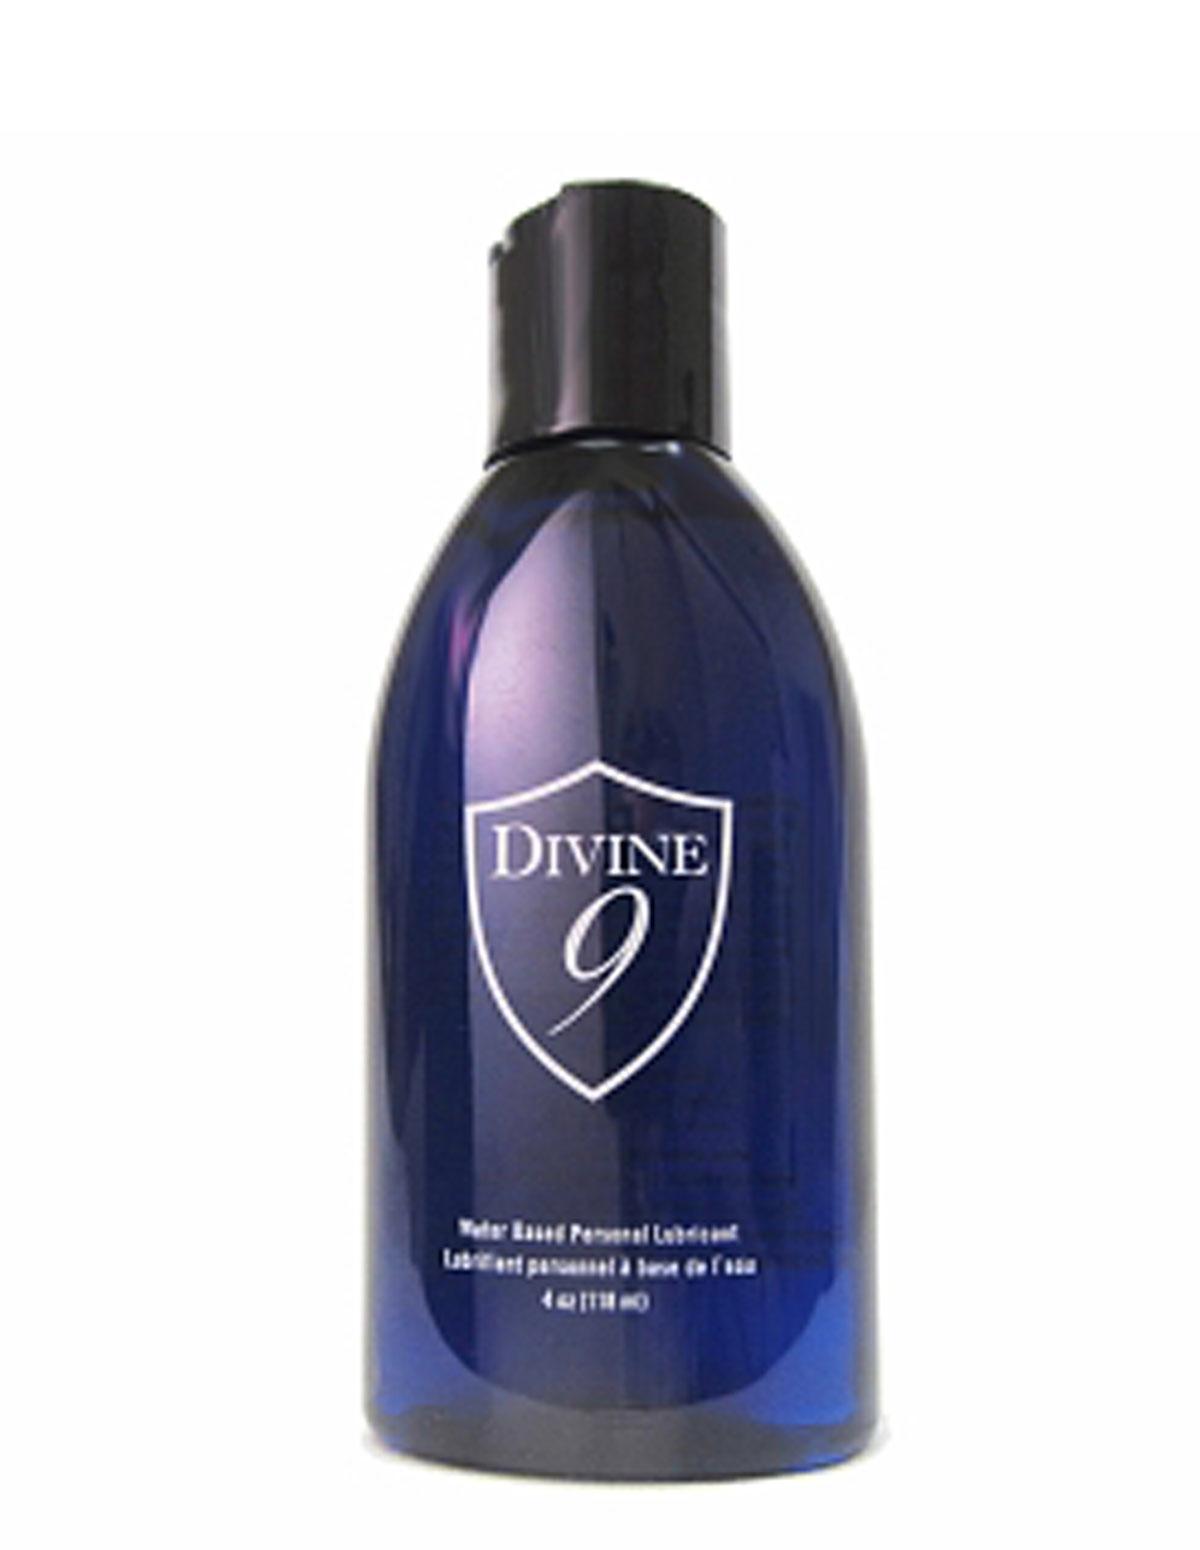 Divine 9 Lubricant 4 Oz Bottle